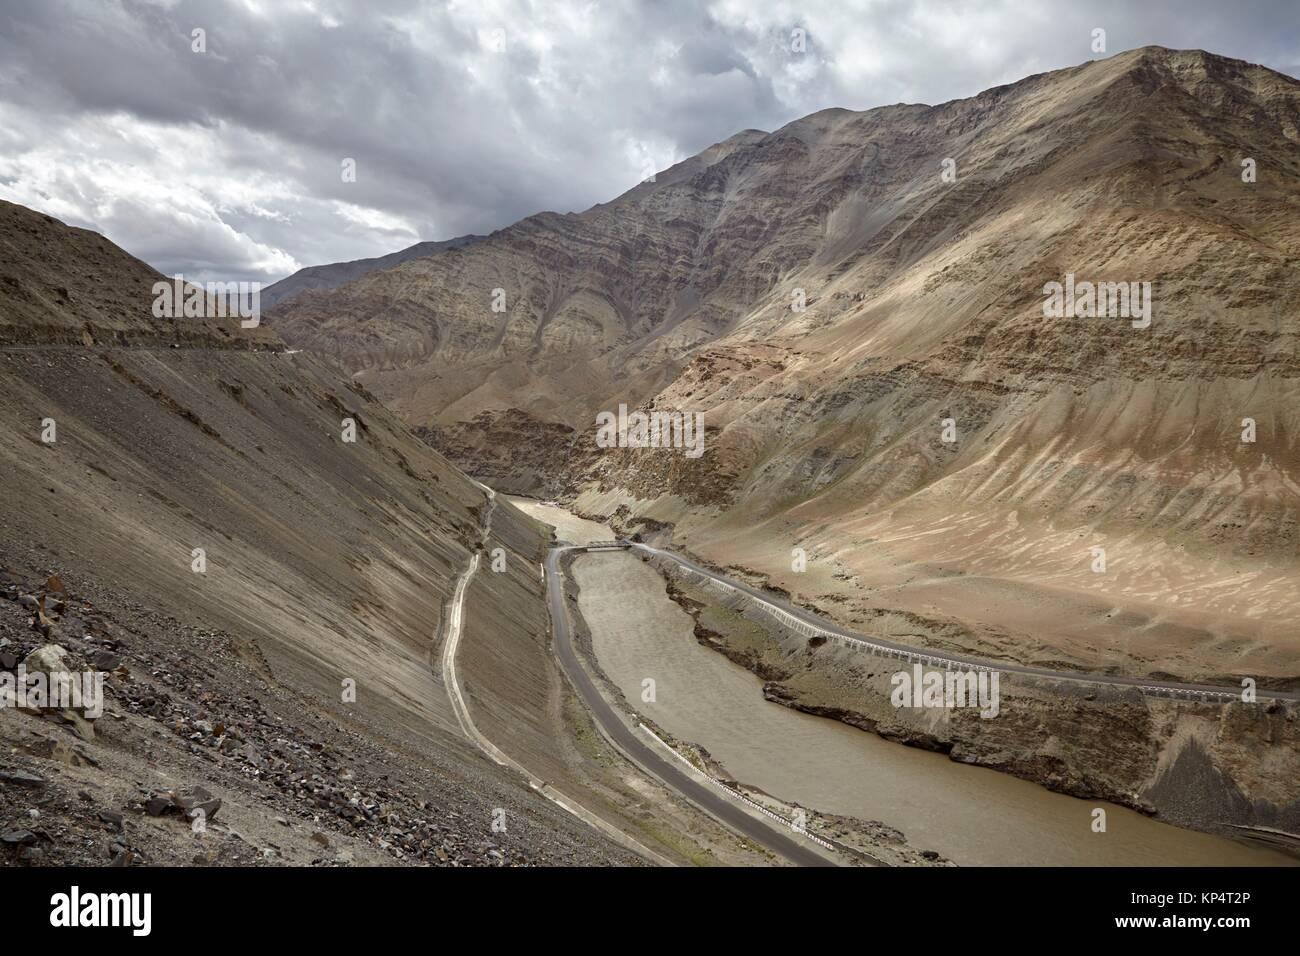 Union del Rio Zanskar y el Rio Indo, Ladakh, India. - Stock Image